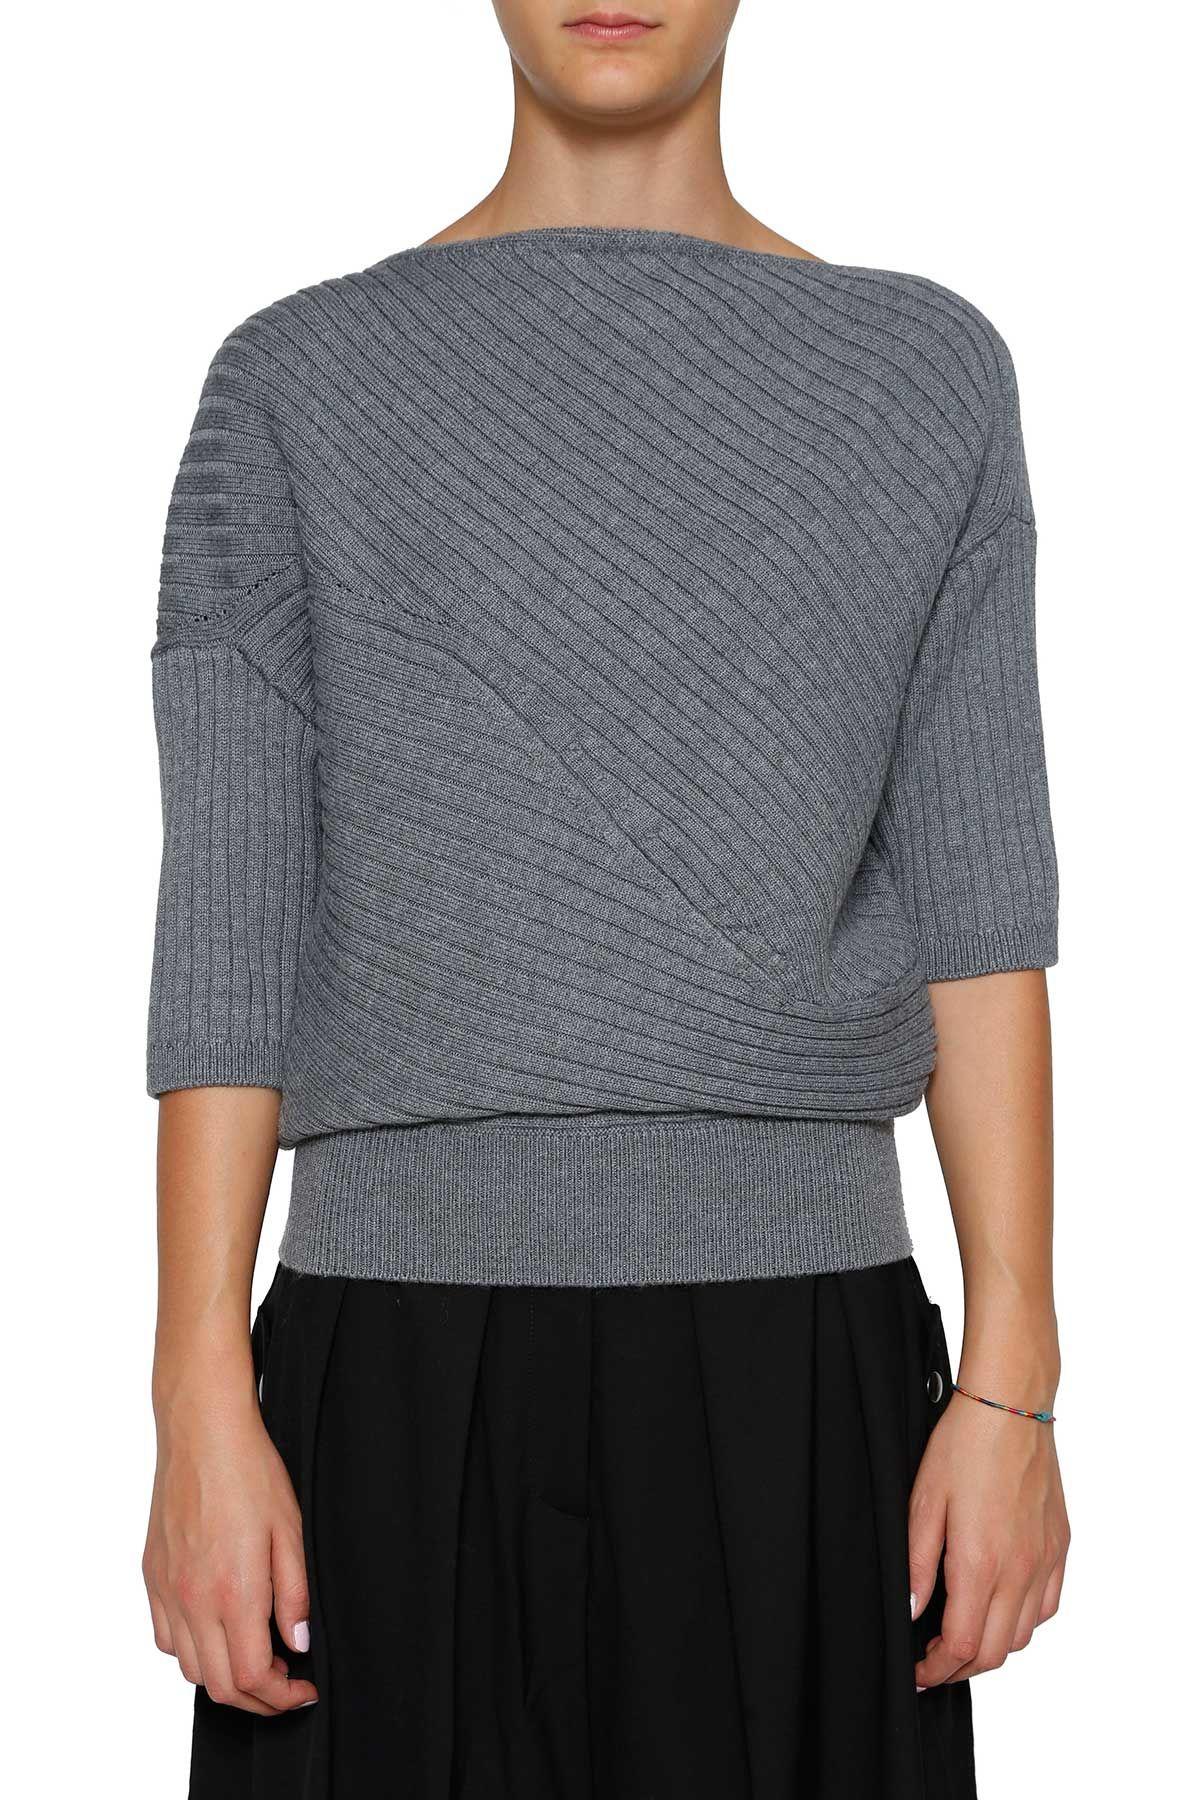 J.w. Anderson Asymmetric Sweater